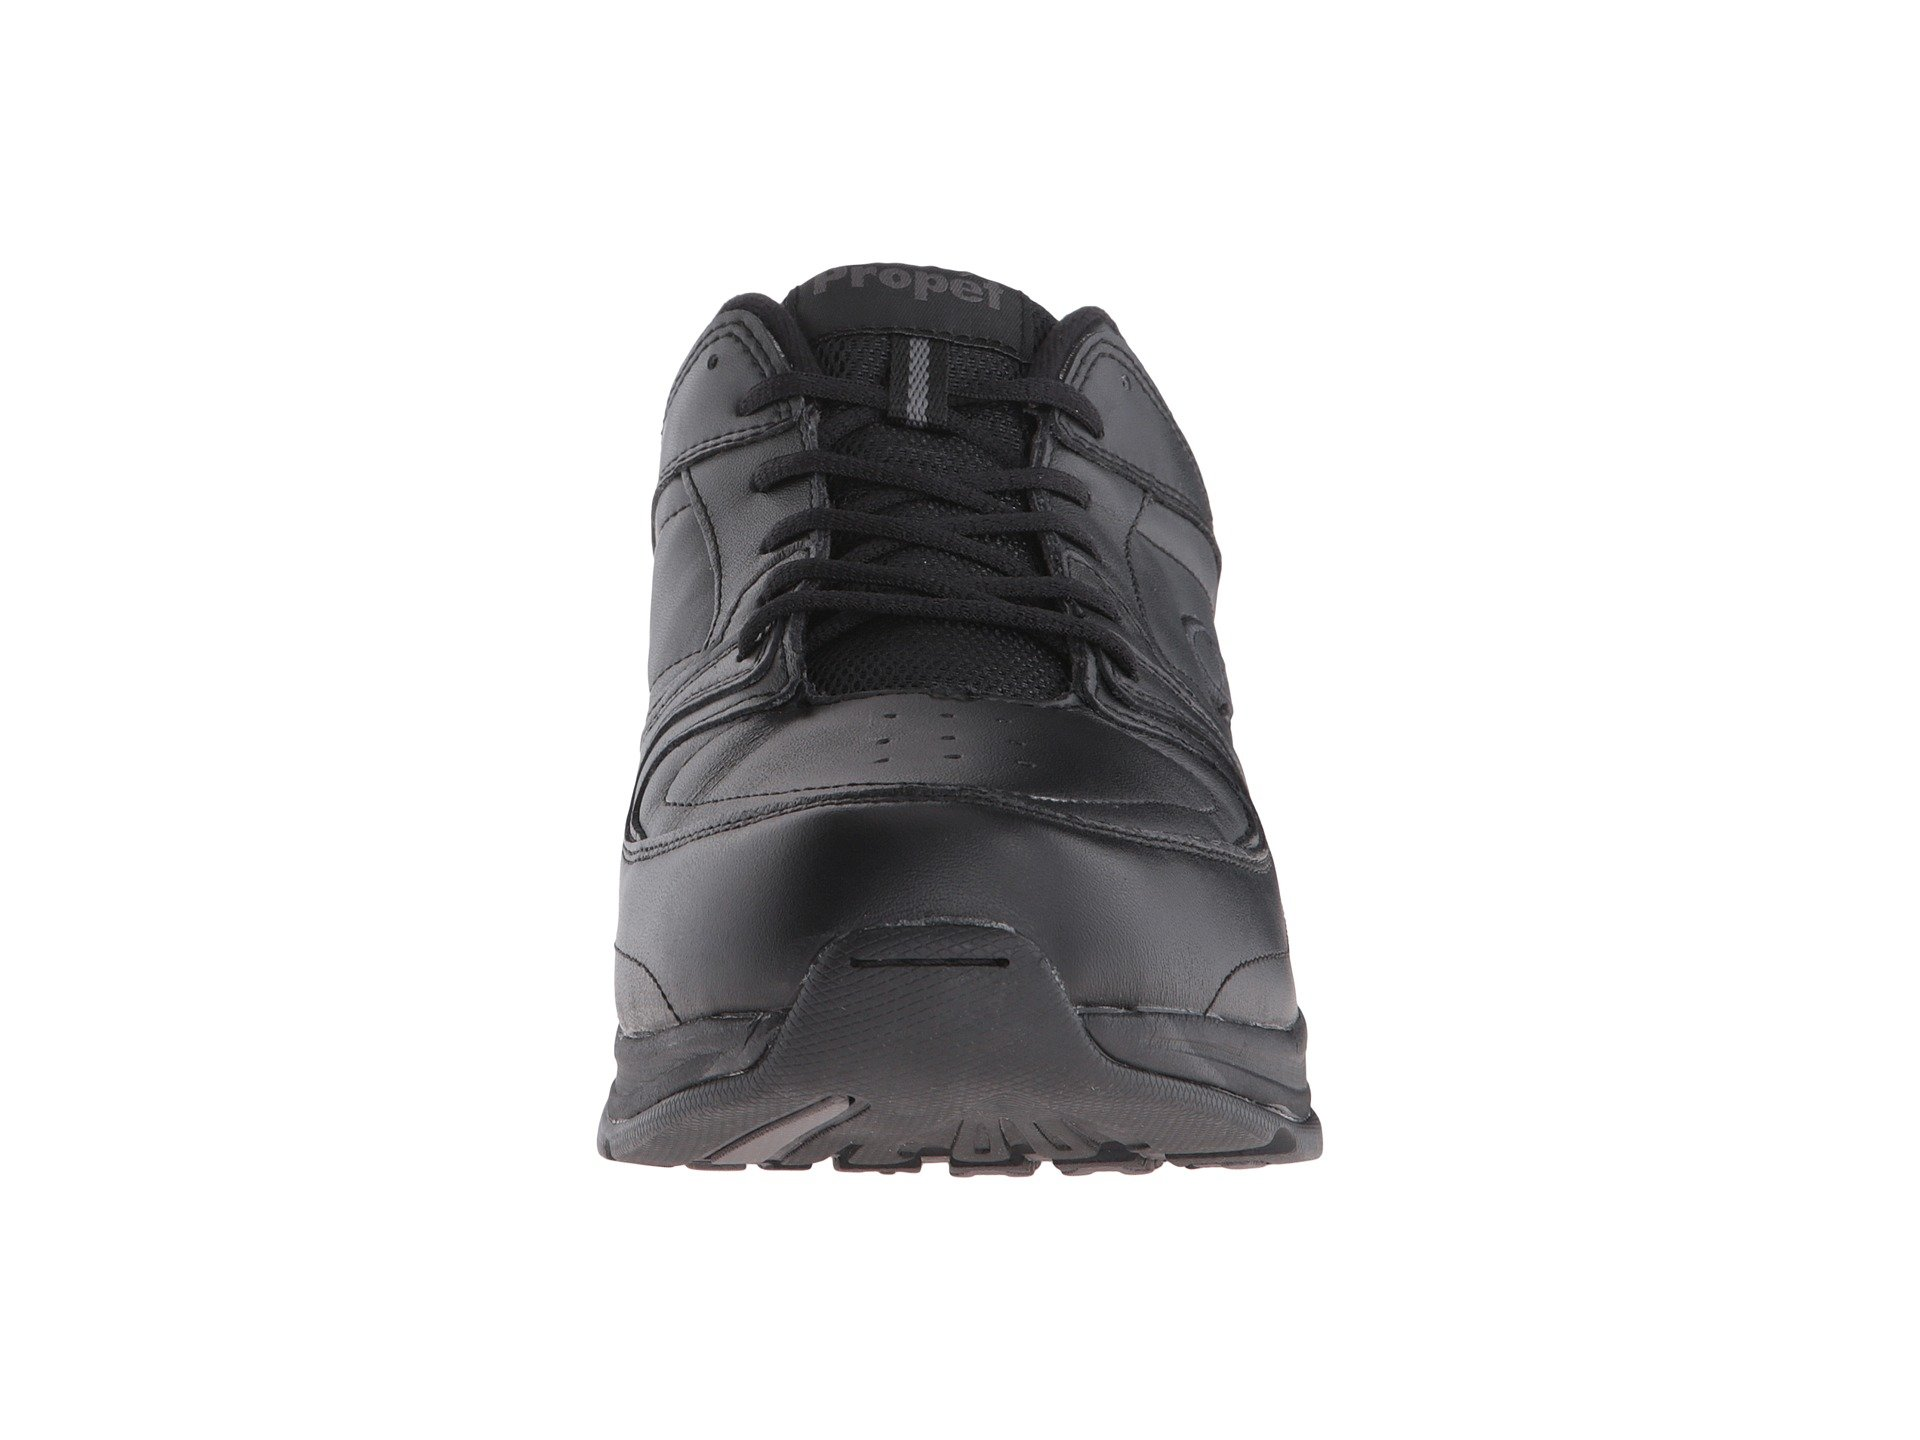 Nike Gratuit 5 Avis Hommes Warner Propet